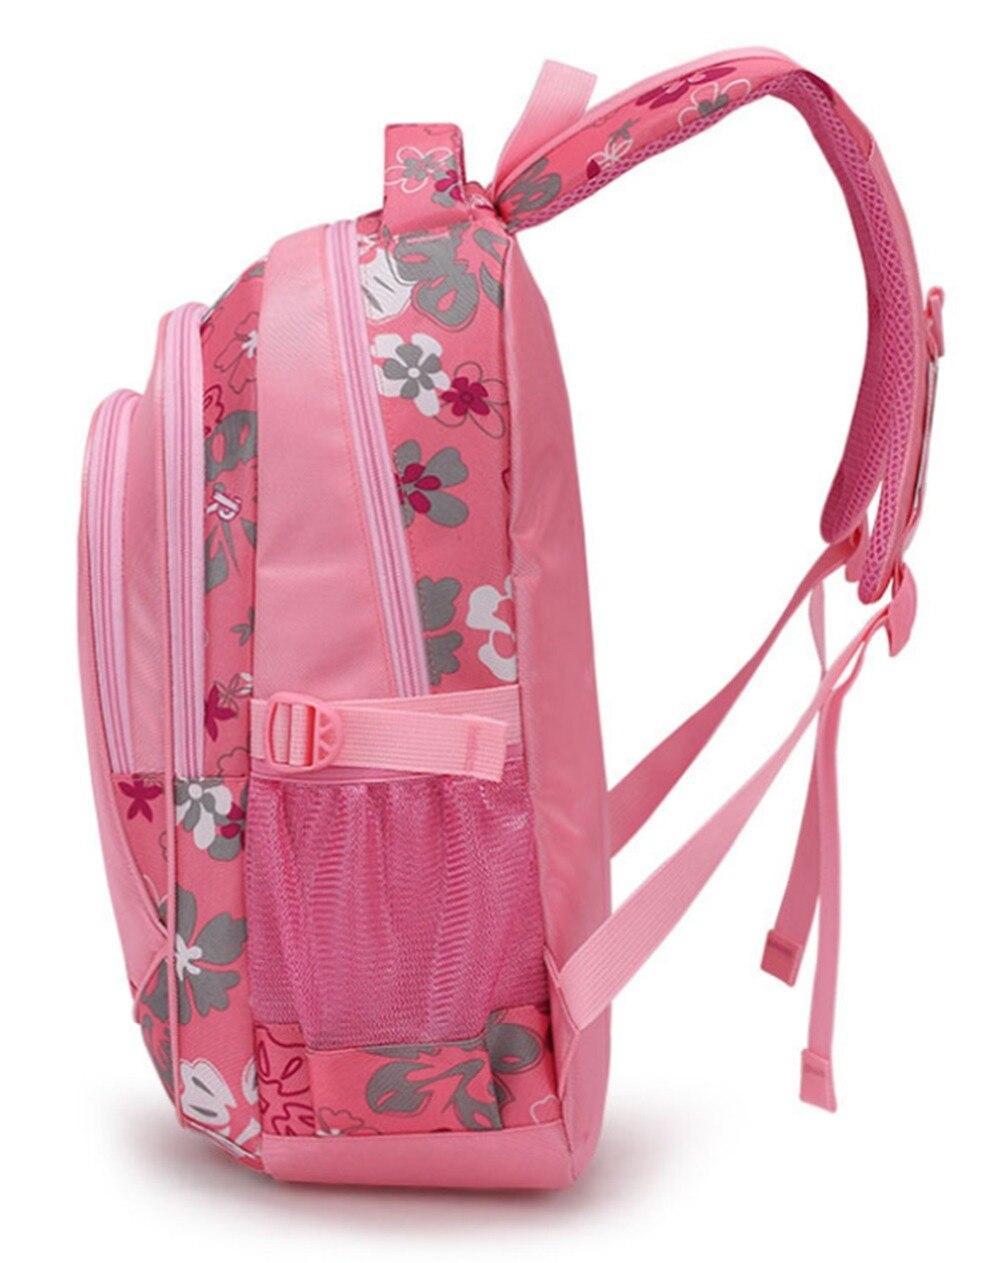 marca mulheres mochila bolsa de Material Principal : Poliéster